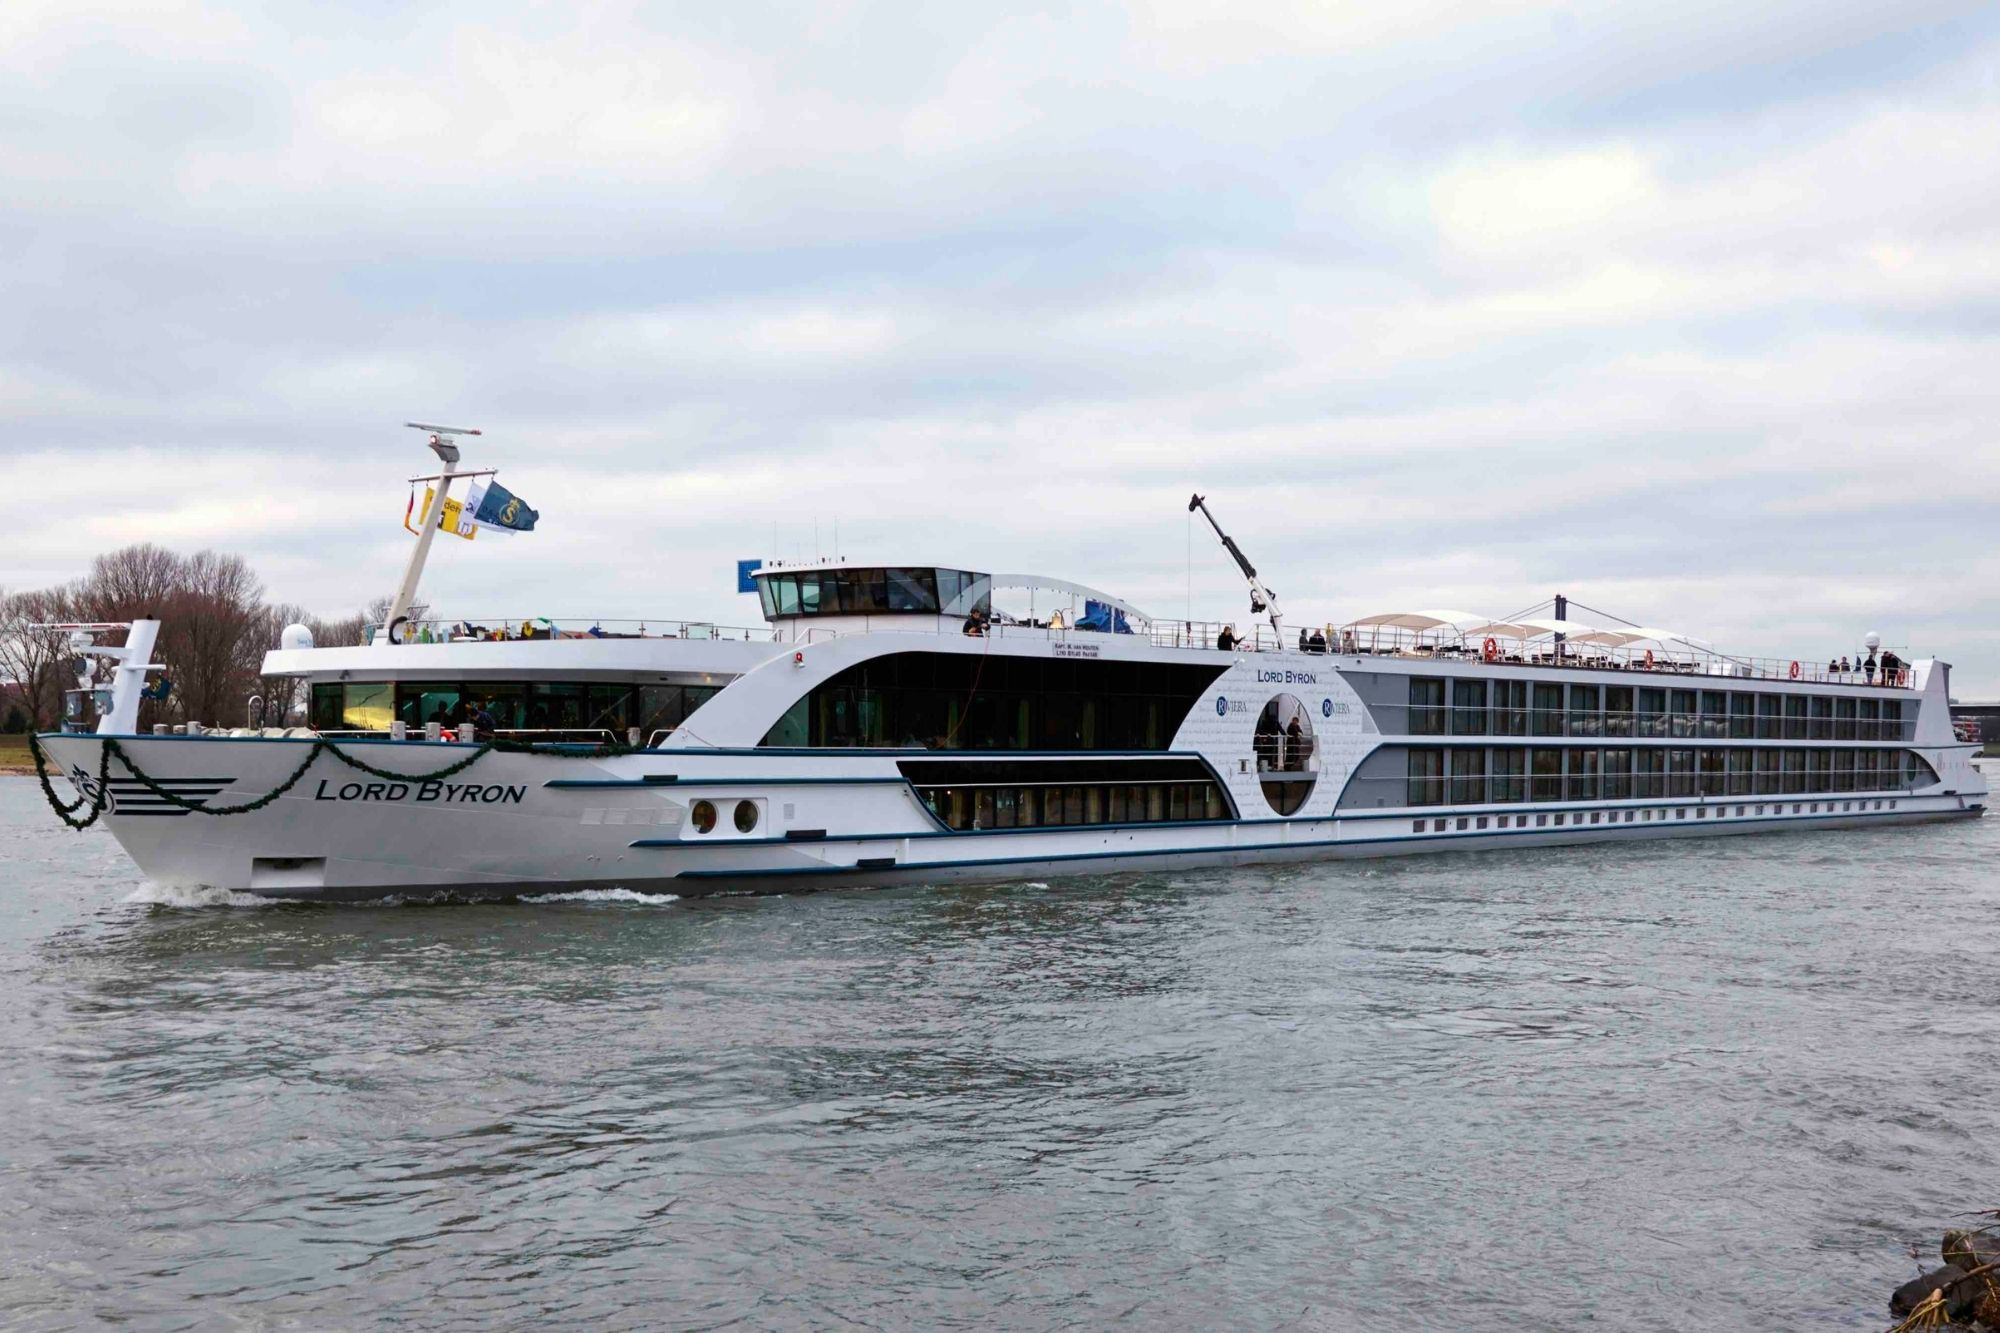 VIVA Cruises: MS LORD BYRON übernimmt Routen von MS SWISS GLORIA